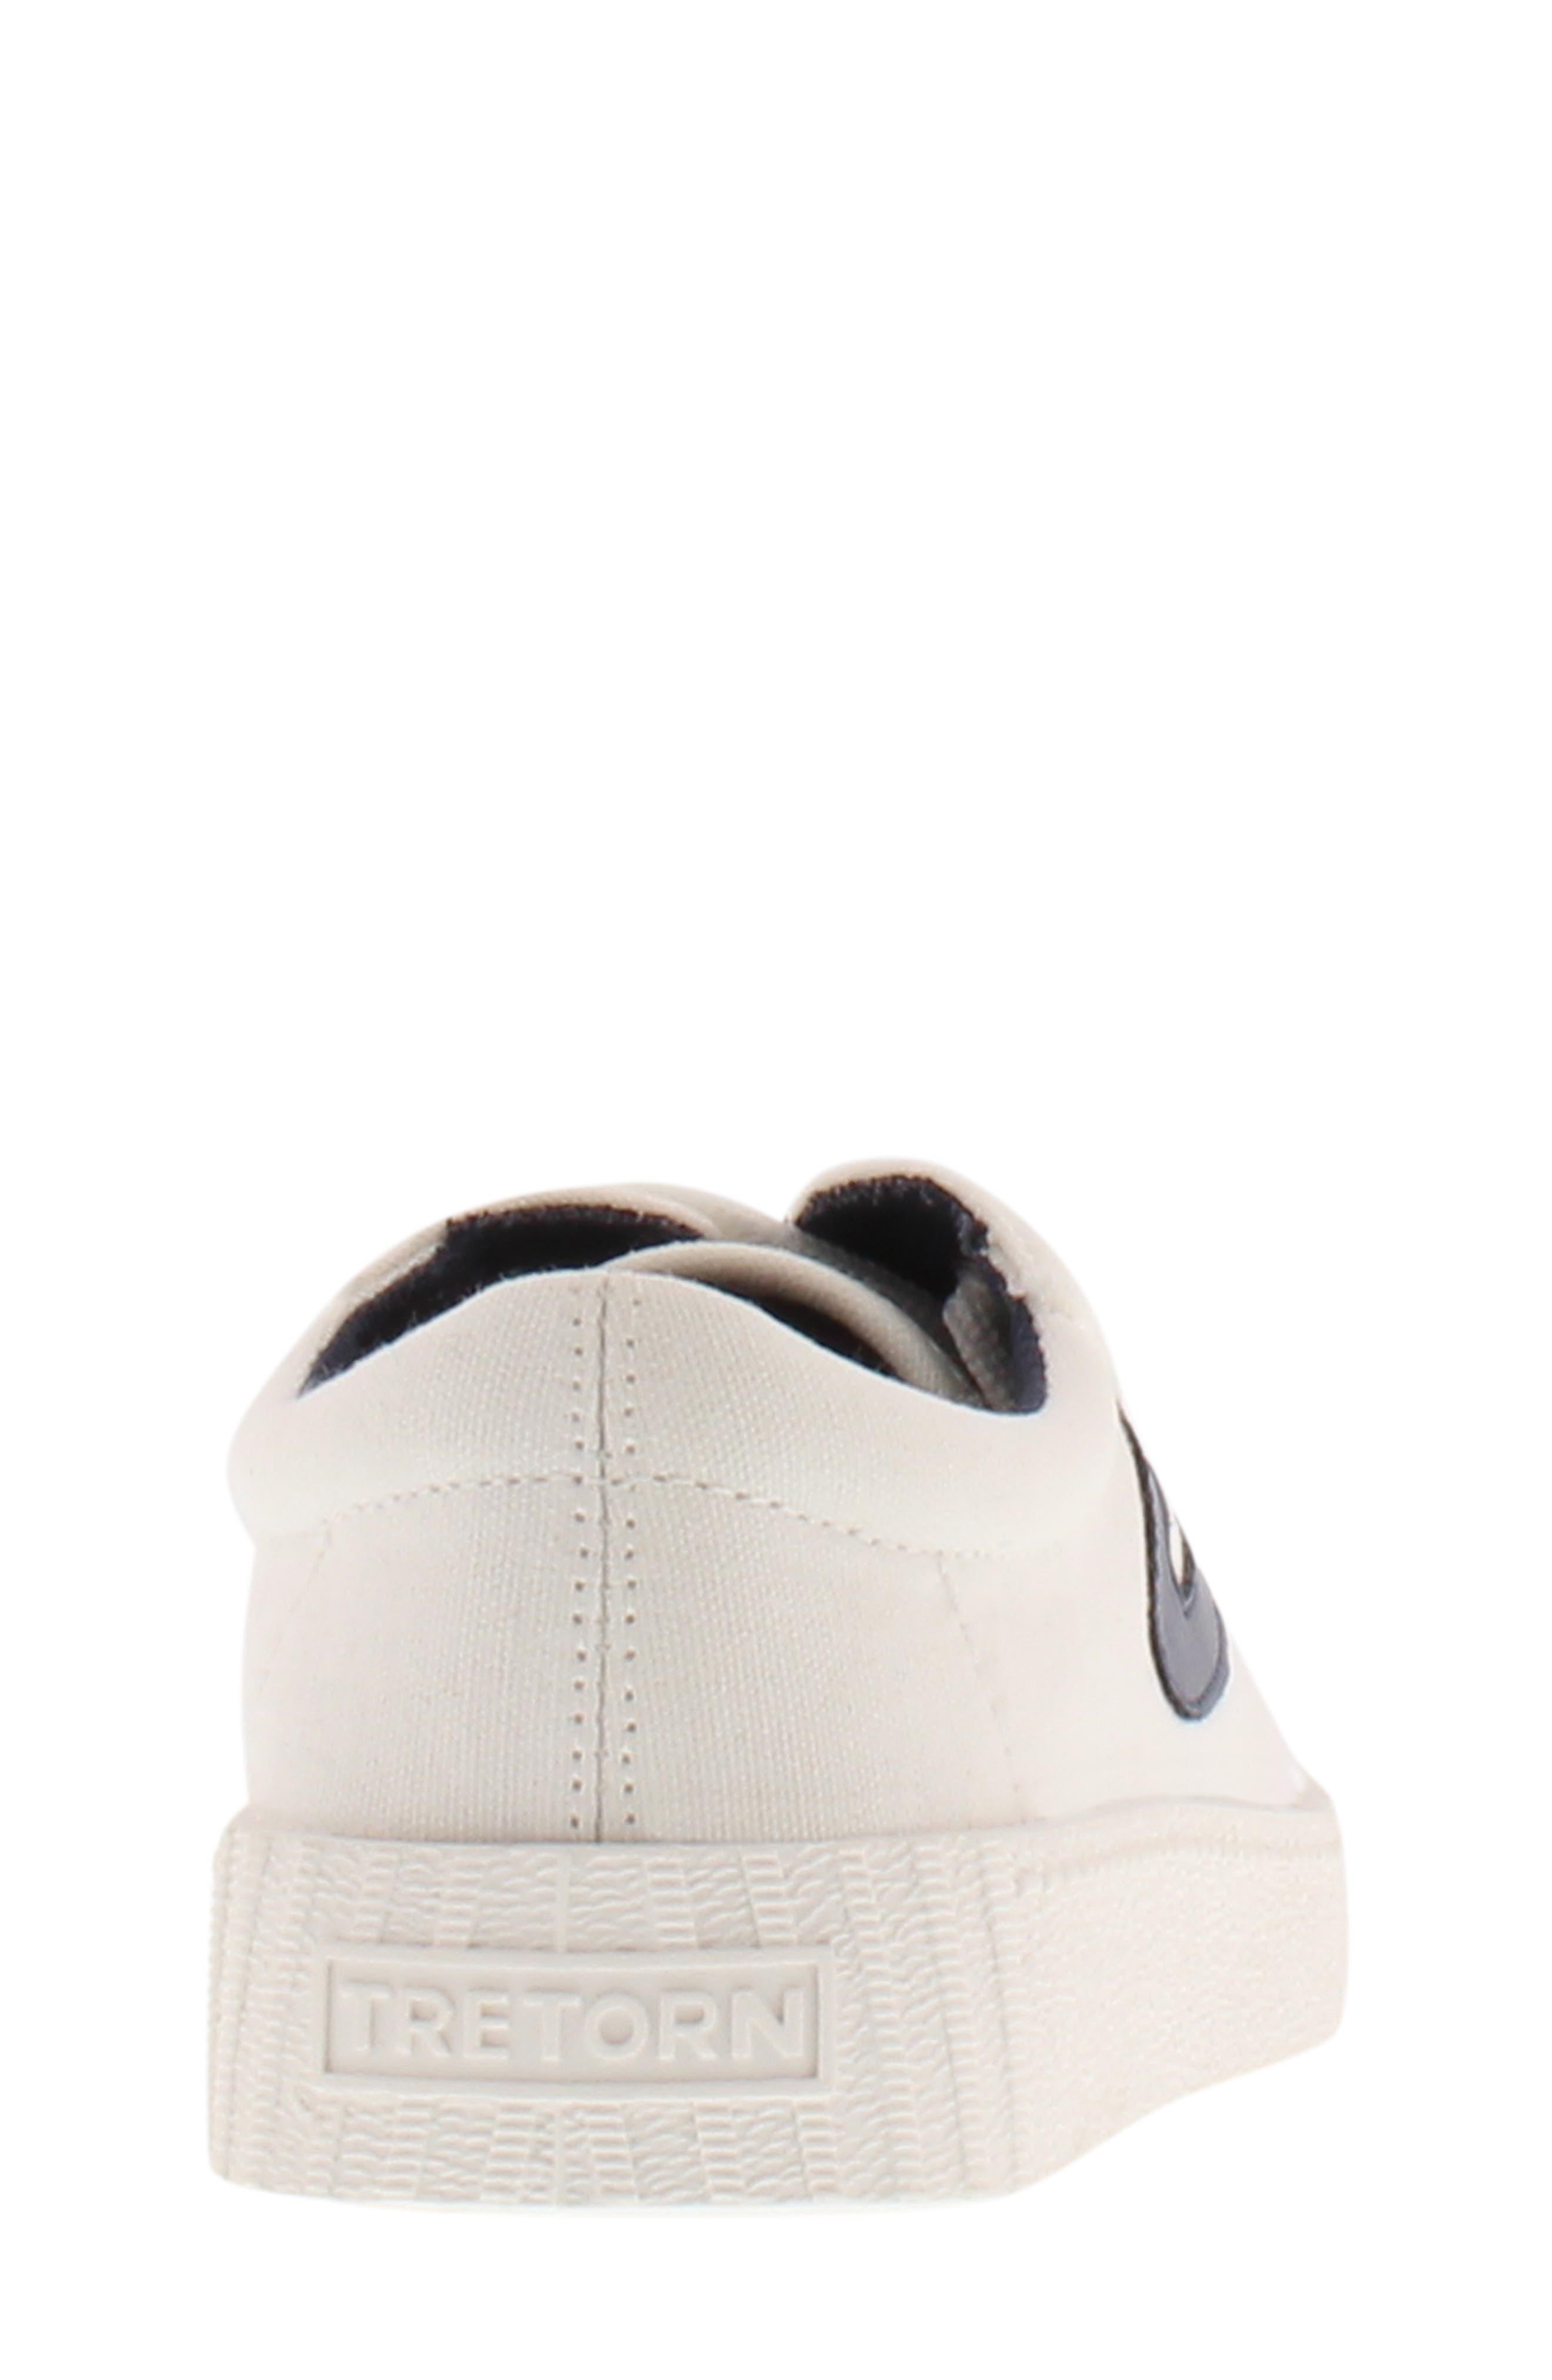 Nylite Plus Sneaker,                             Alternate thumbnail 7, color,                             WHITE/ NIGHT